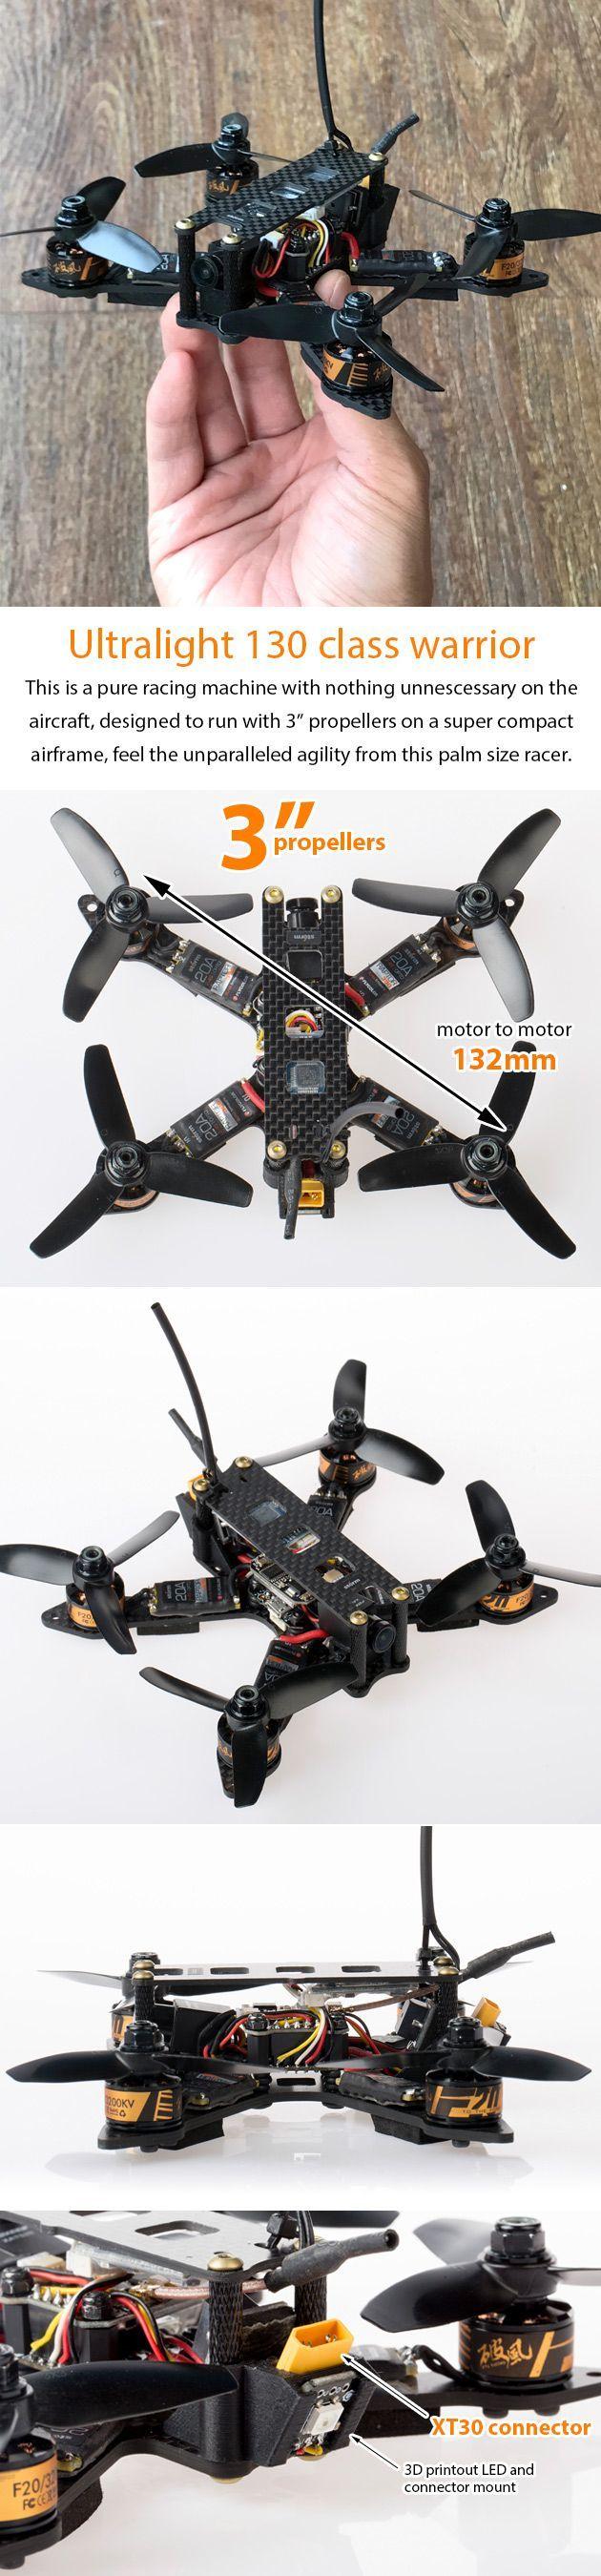 Military Drone: STORM Racing Drone (RTF / SRD130S Loki-X3S / BetaFlight) www.hel...